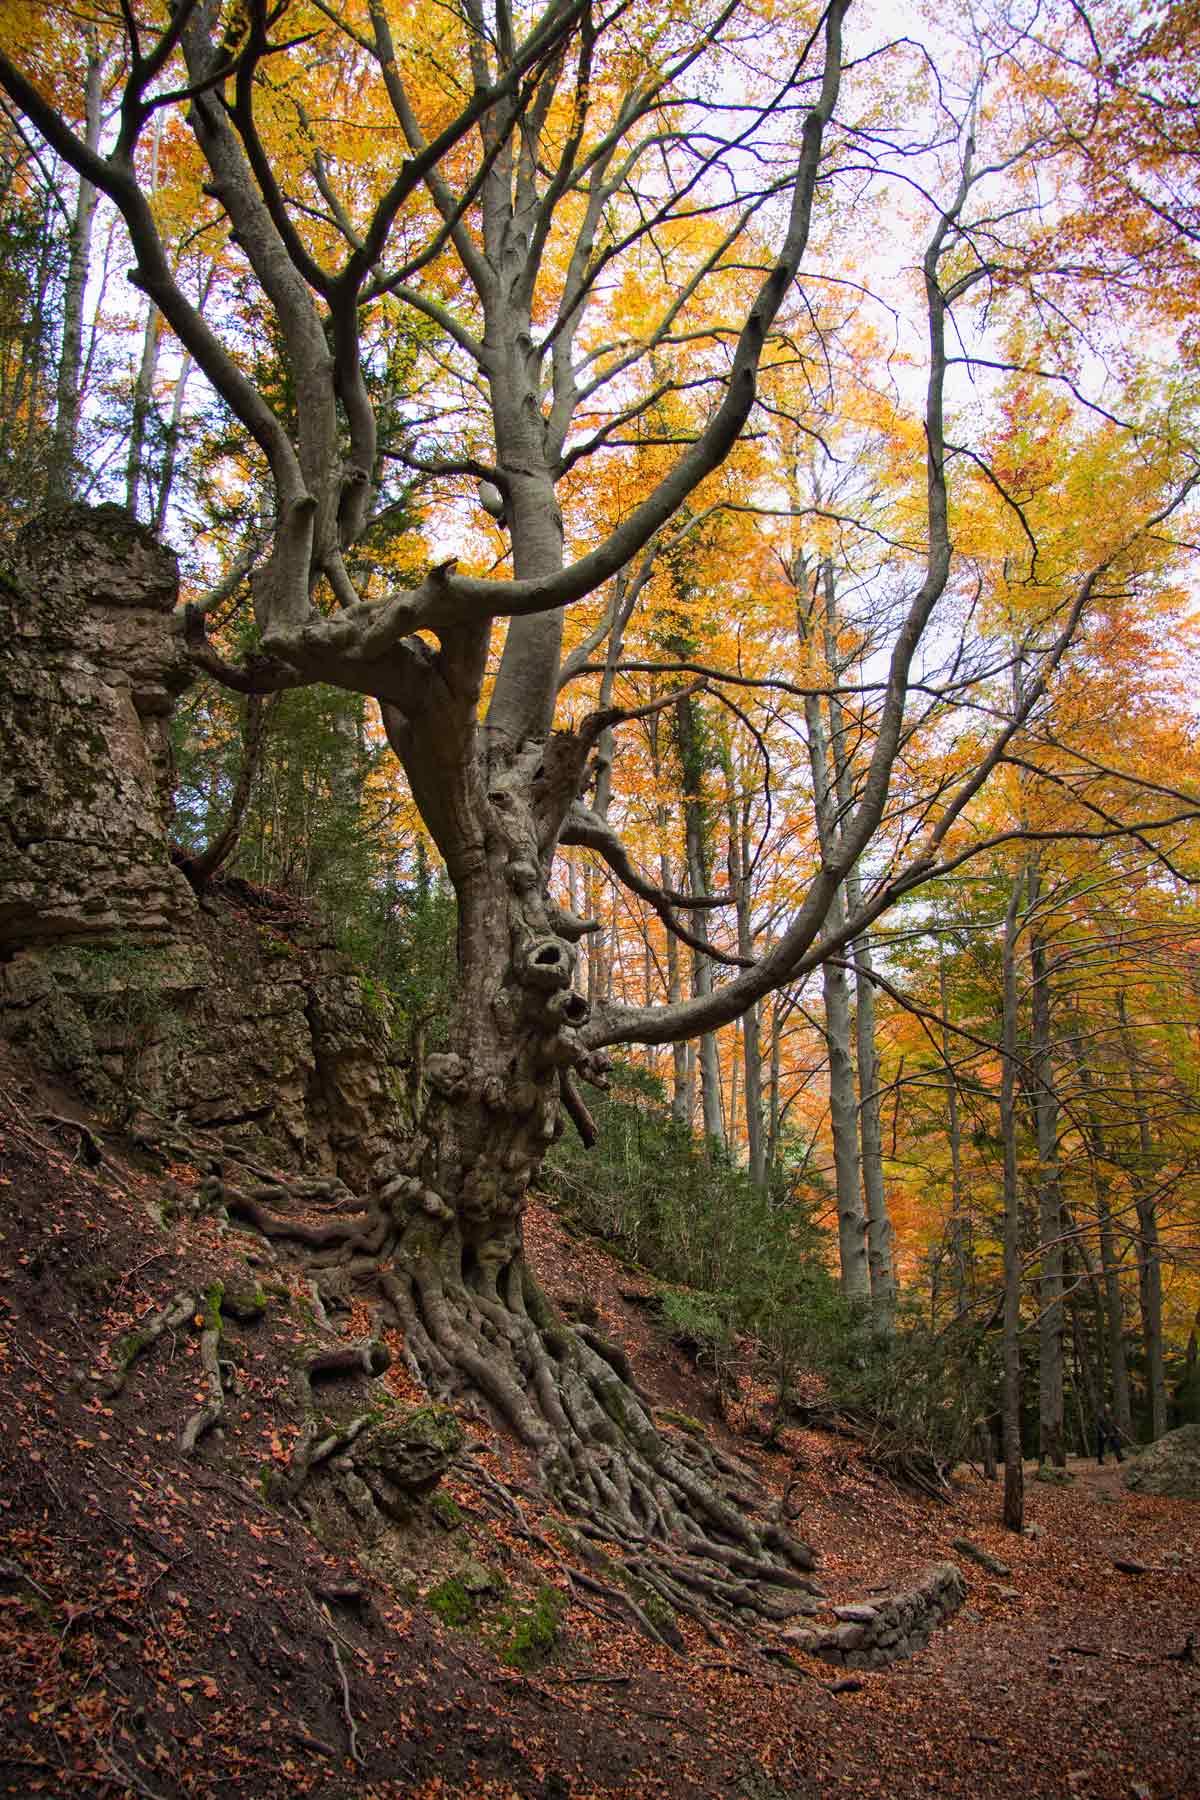 El faig Pare és un arbre monumental de la fageda del Retaule